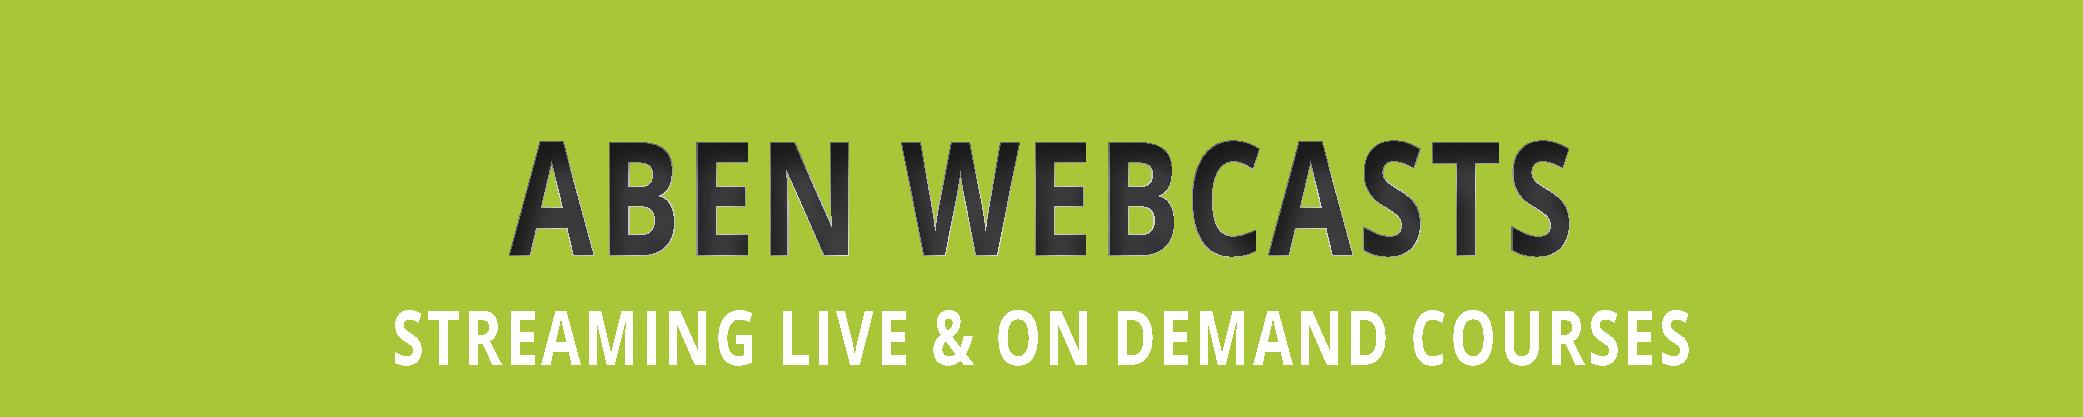 ABEN_Webcasts